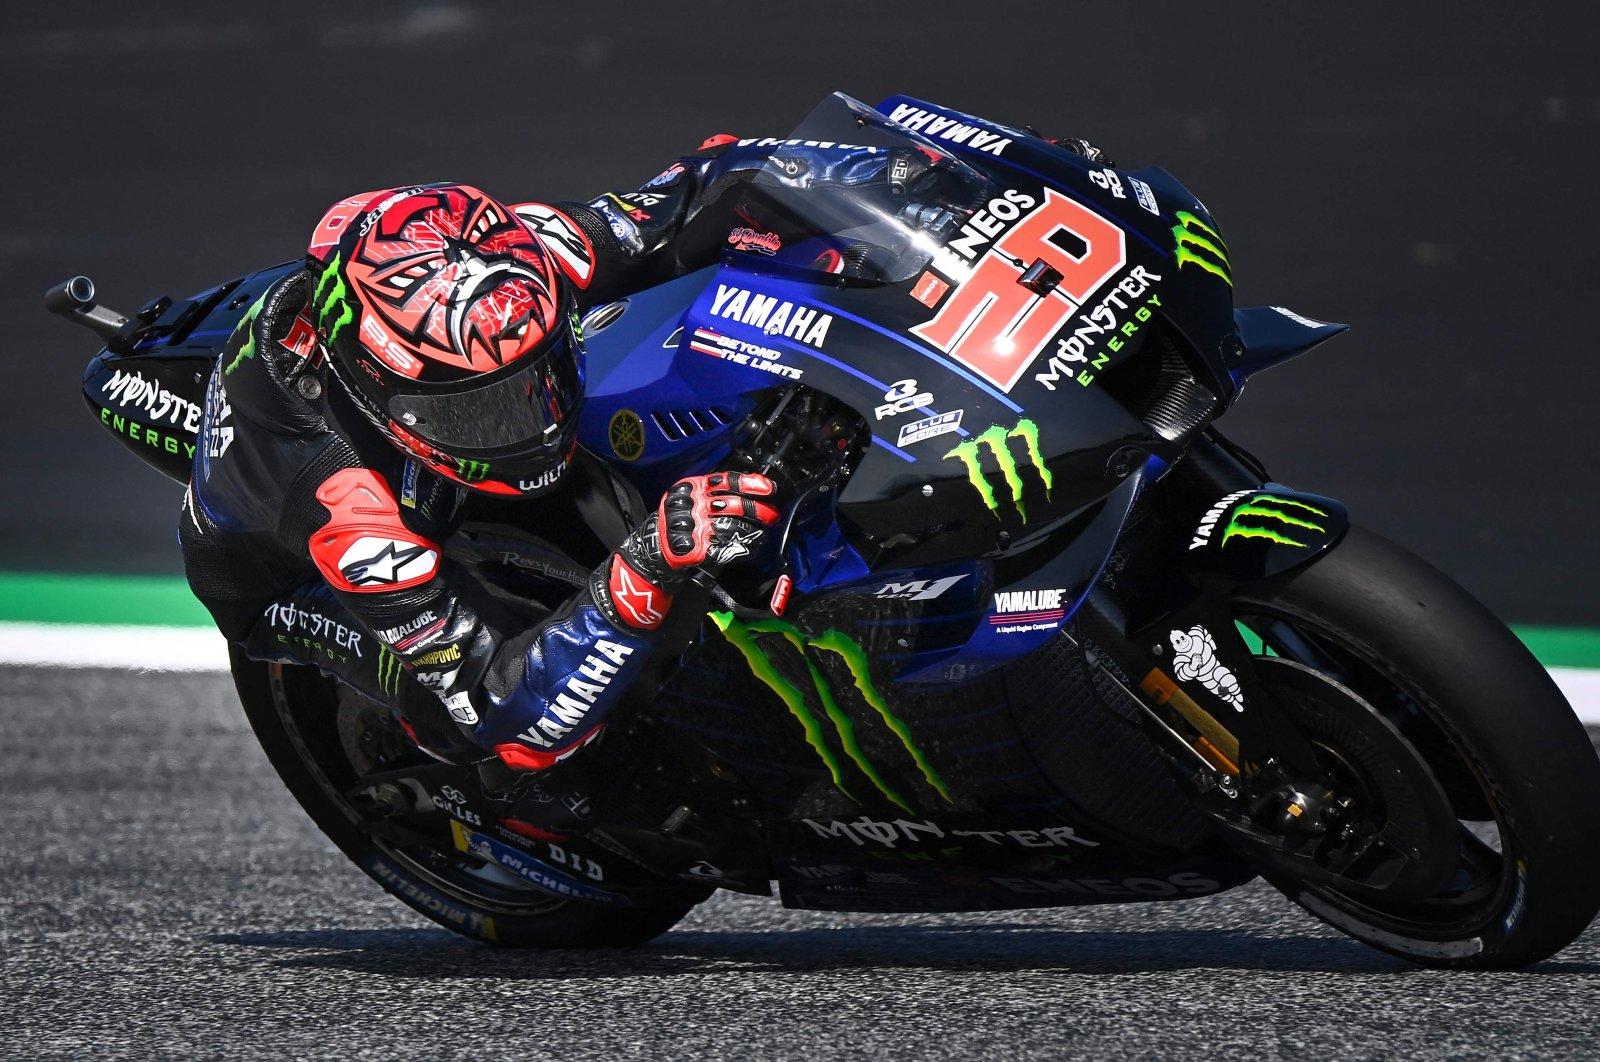 Fabio Quartararo steers his motorbike during the first free practice session ahead of Austrian MotoGP, in Spielberg, Austria, Aug. 13, 2021. (AFP PHOTO)